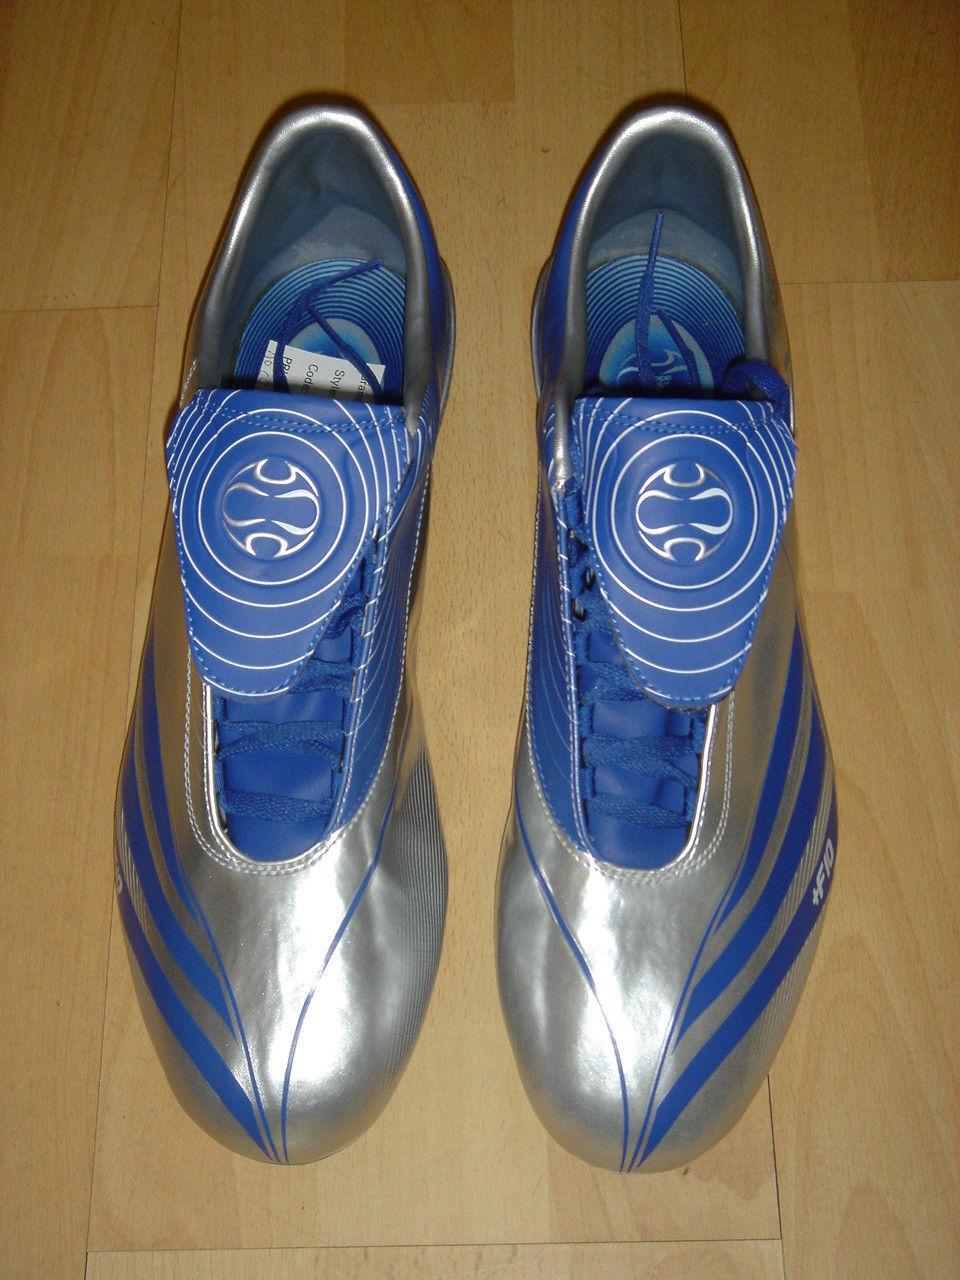 Adidas F10.7 Soccer stivali F 10 Football Football Football Soft Ground scarpe grigio NEW c8681d